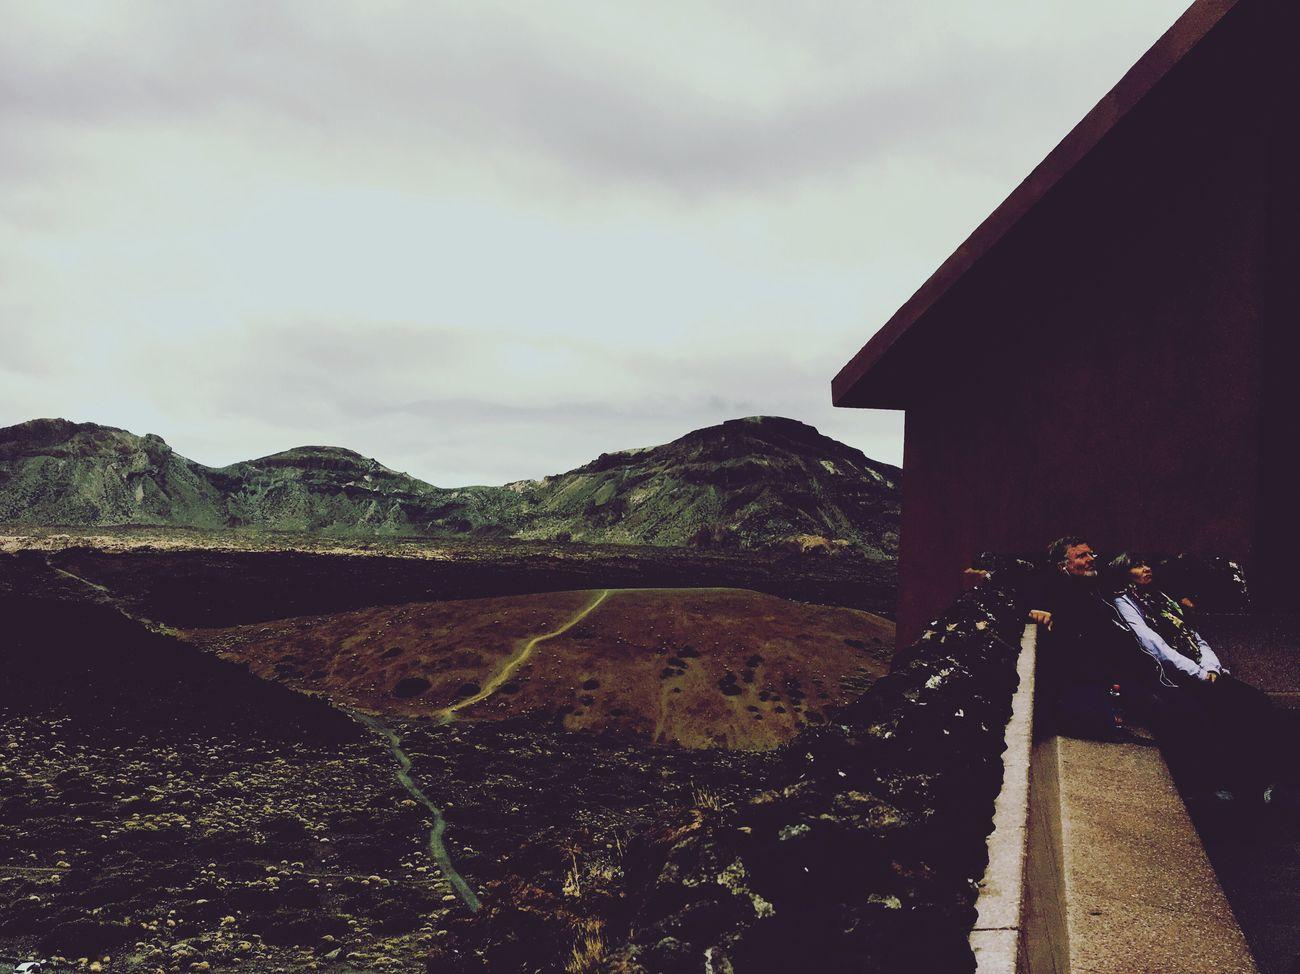 Sky Mountain Day Nature Beauty In Nature Strangers In Love Telepheric Tenerife Island